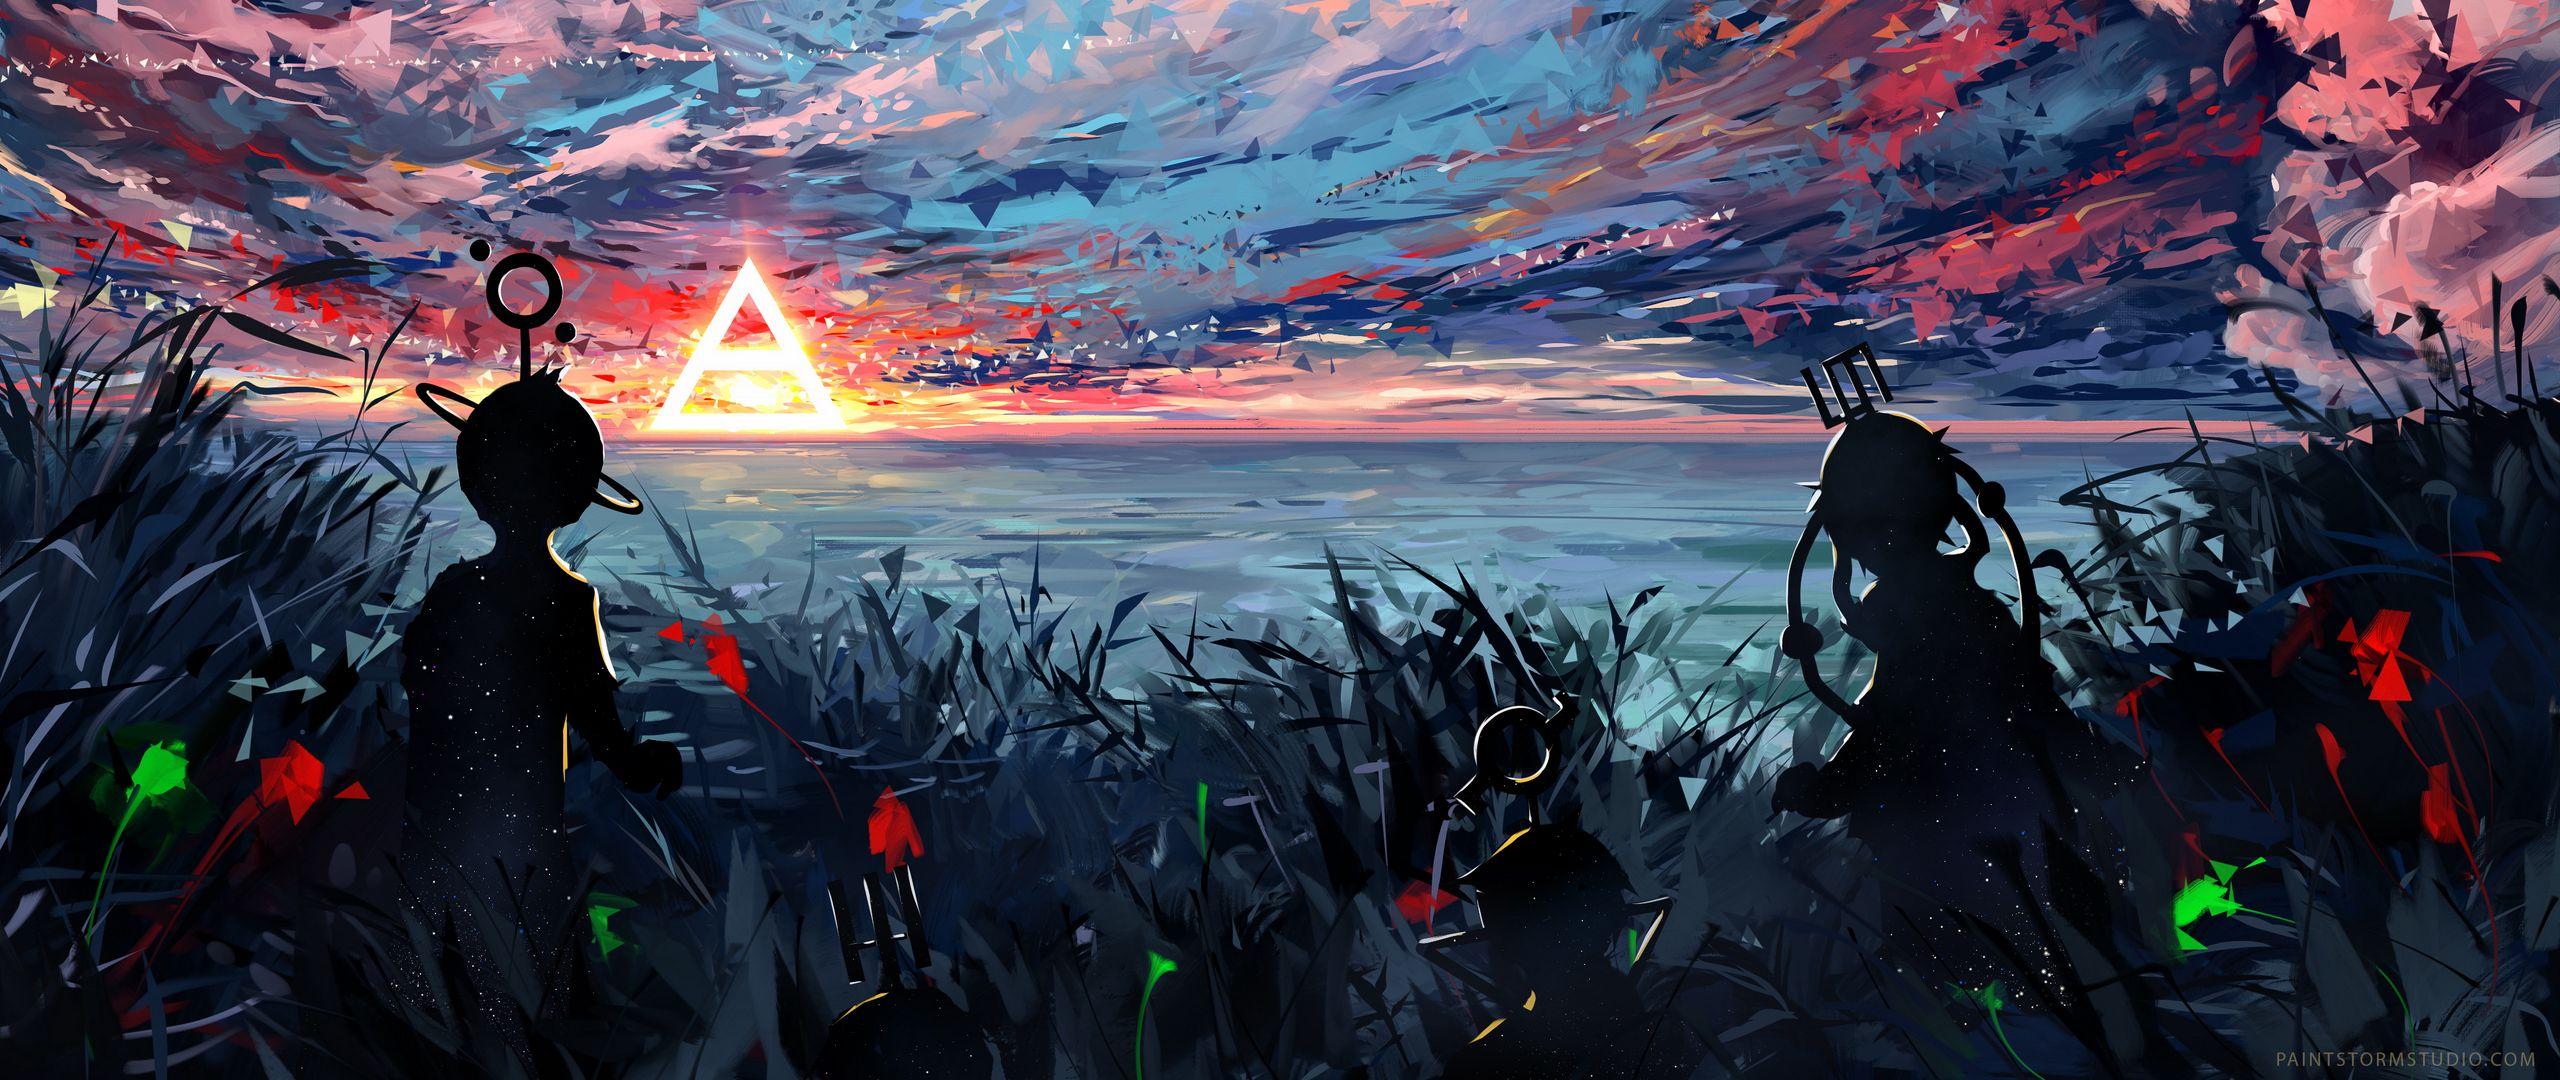 2560x1080 Wallpaper silhouette, art, sky, spots, colorful